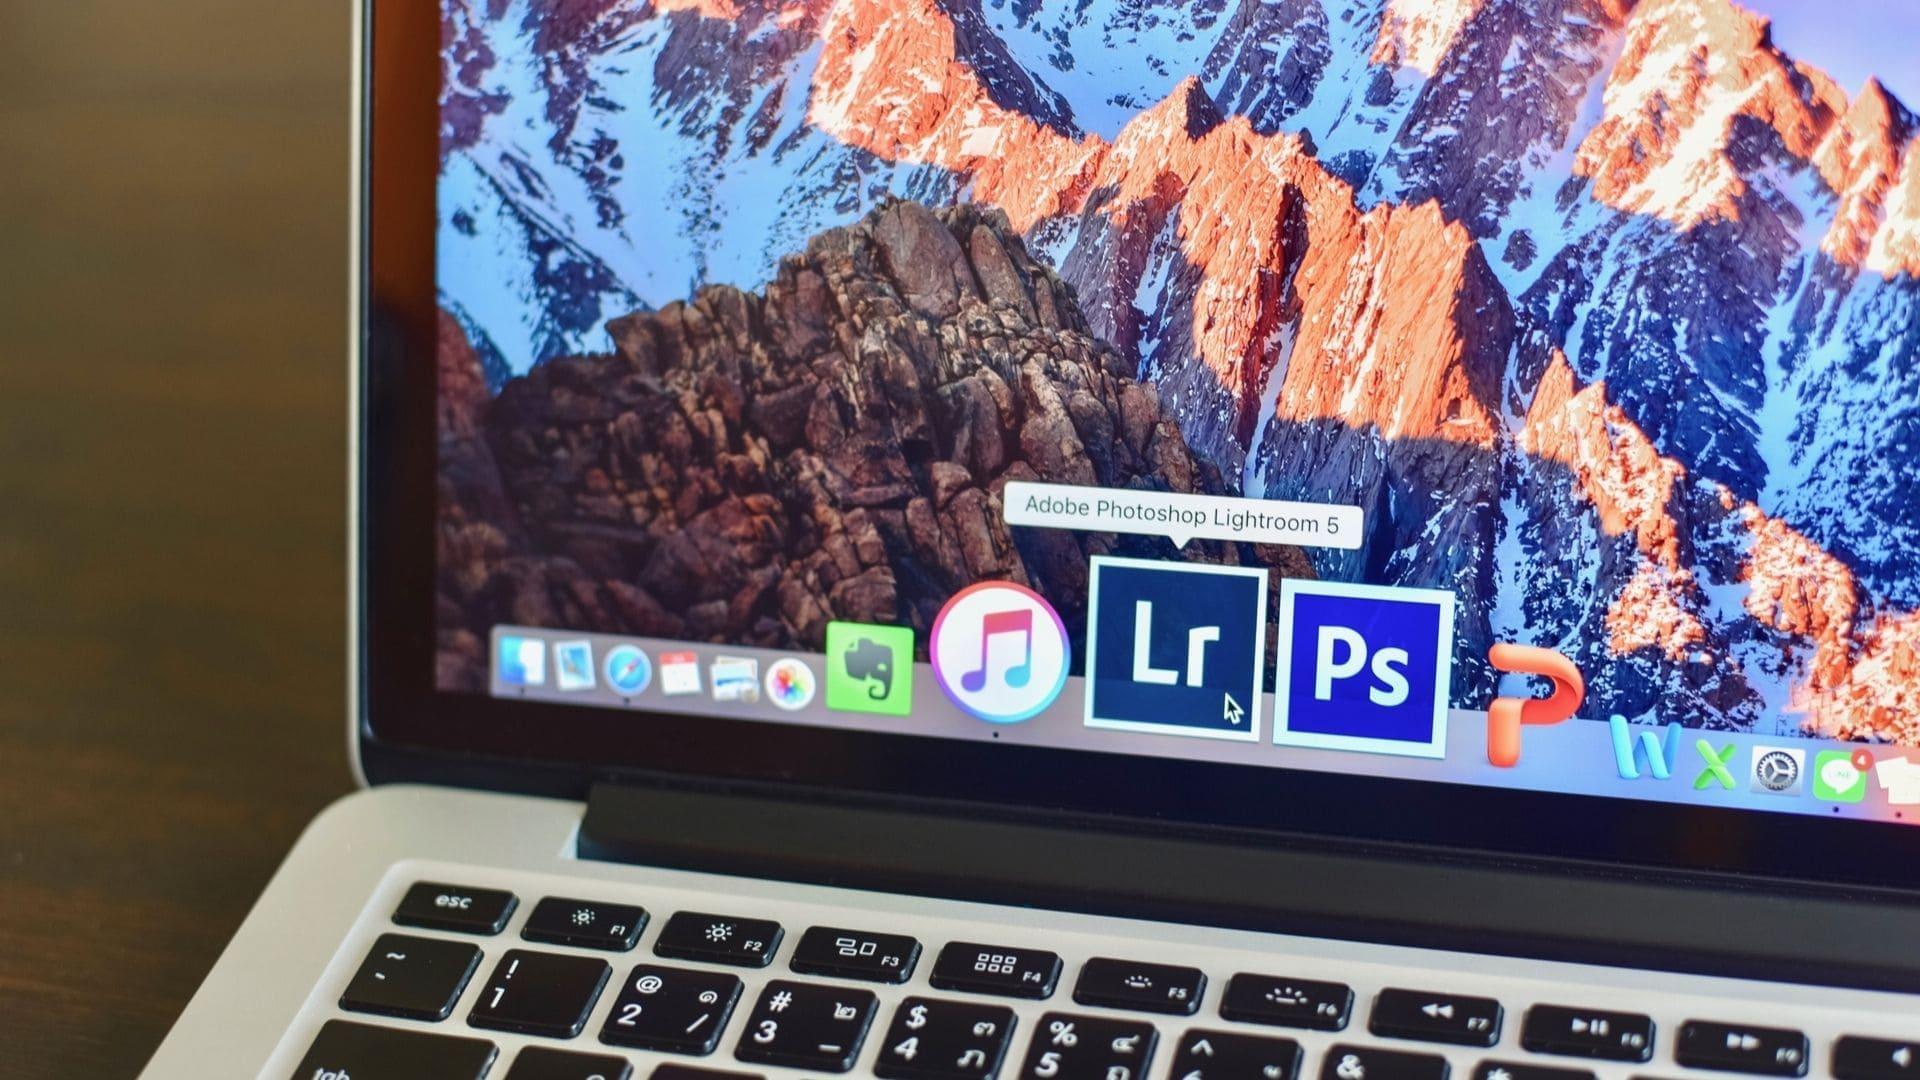 Tela de notebook mostra ícone de editor de fotos para PC Adobe Lightroom